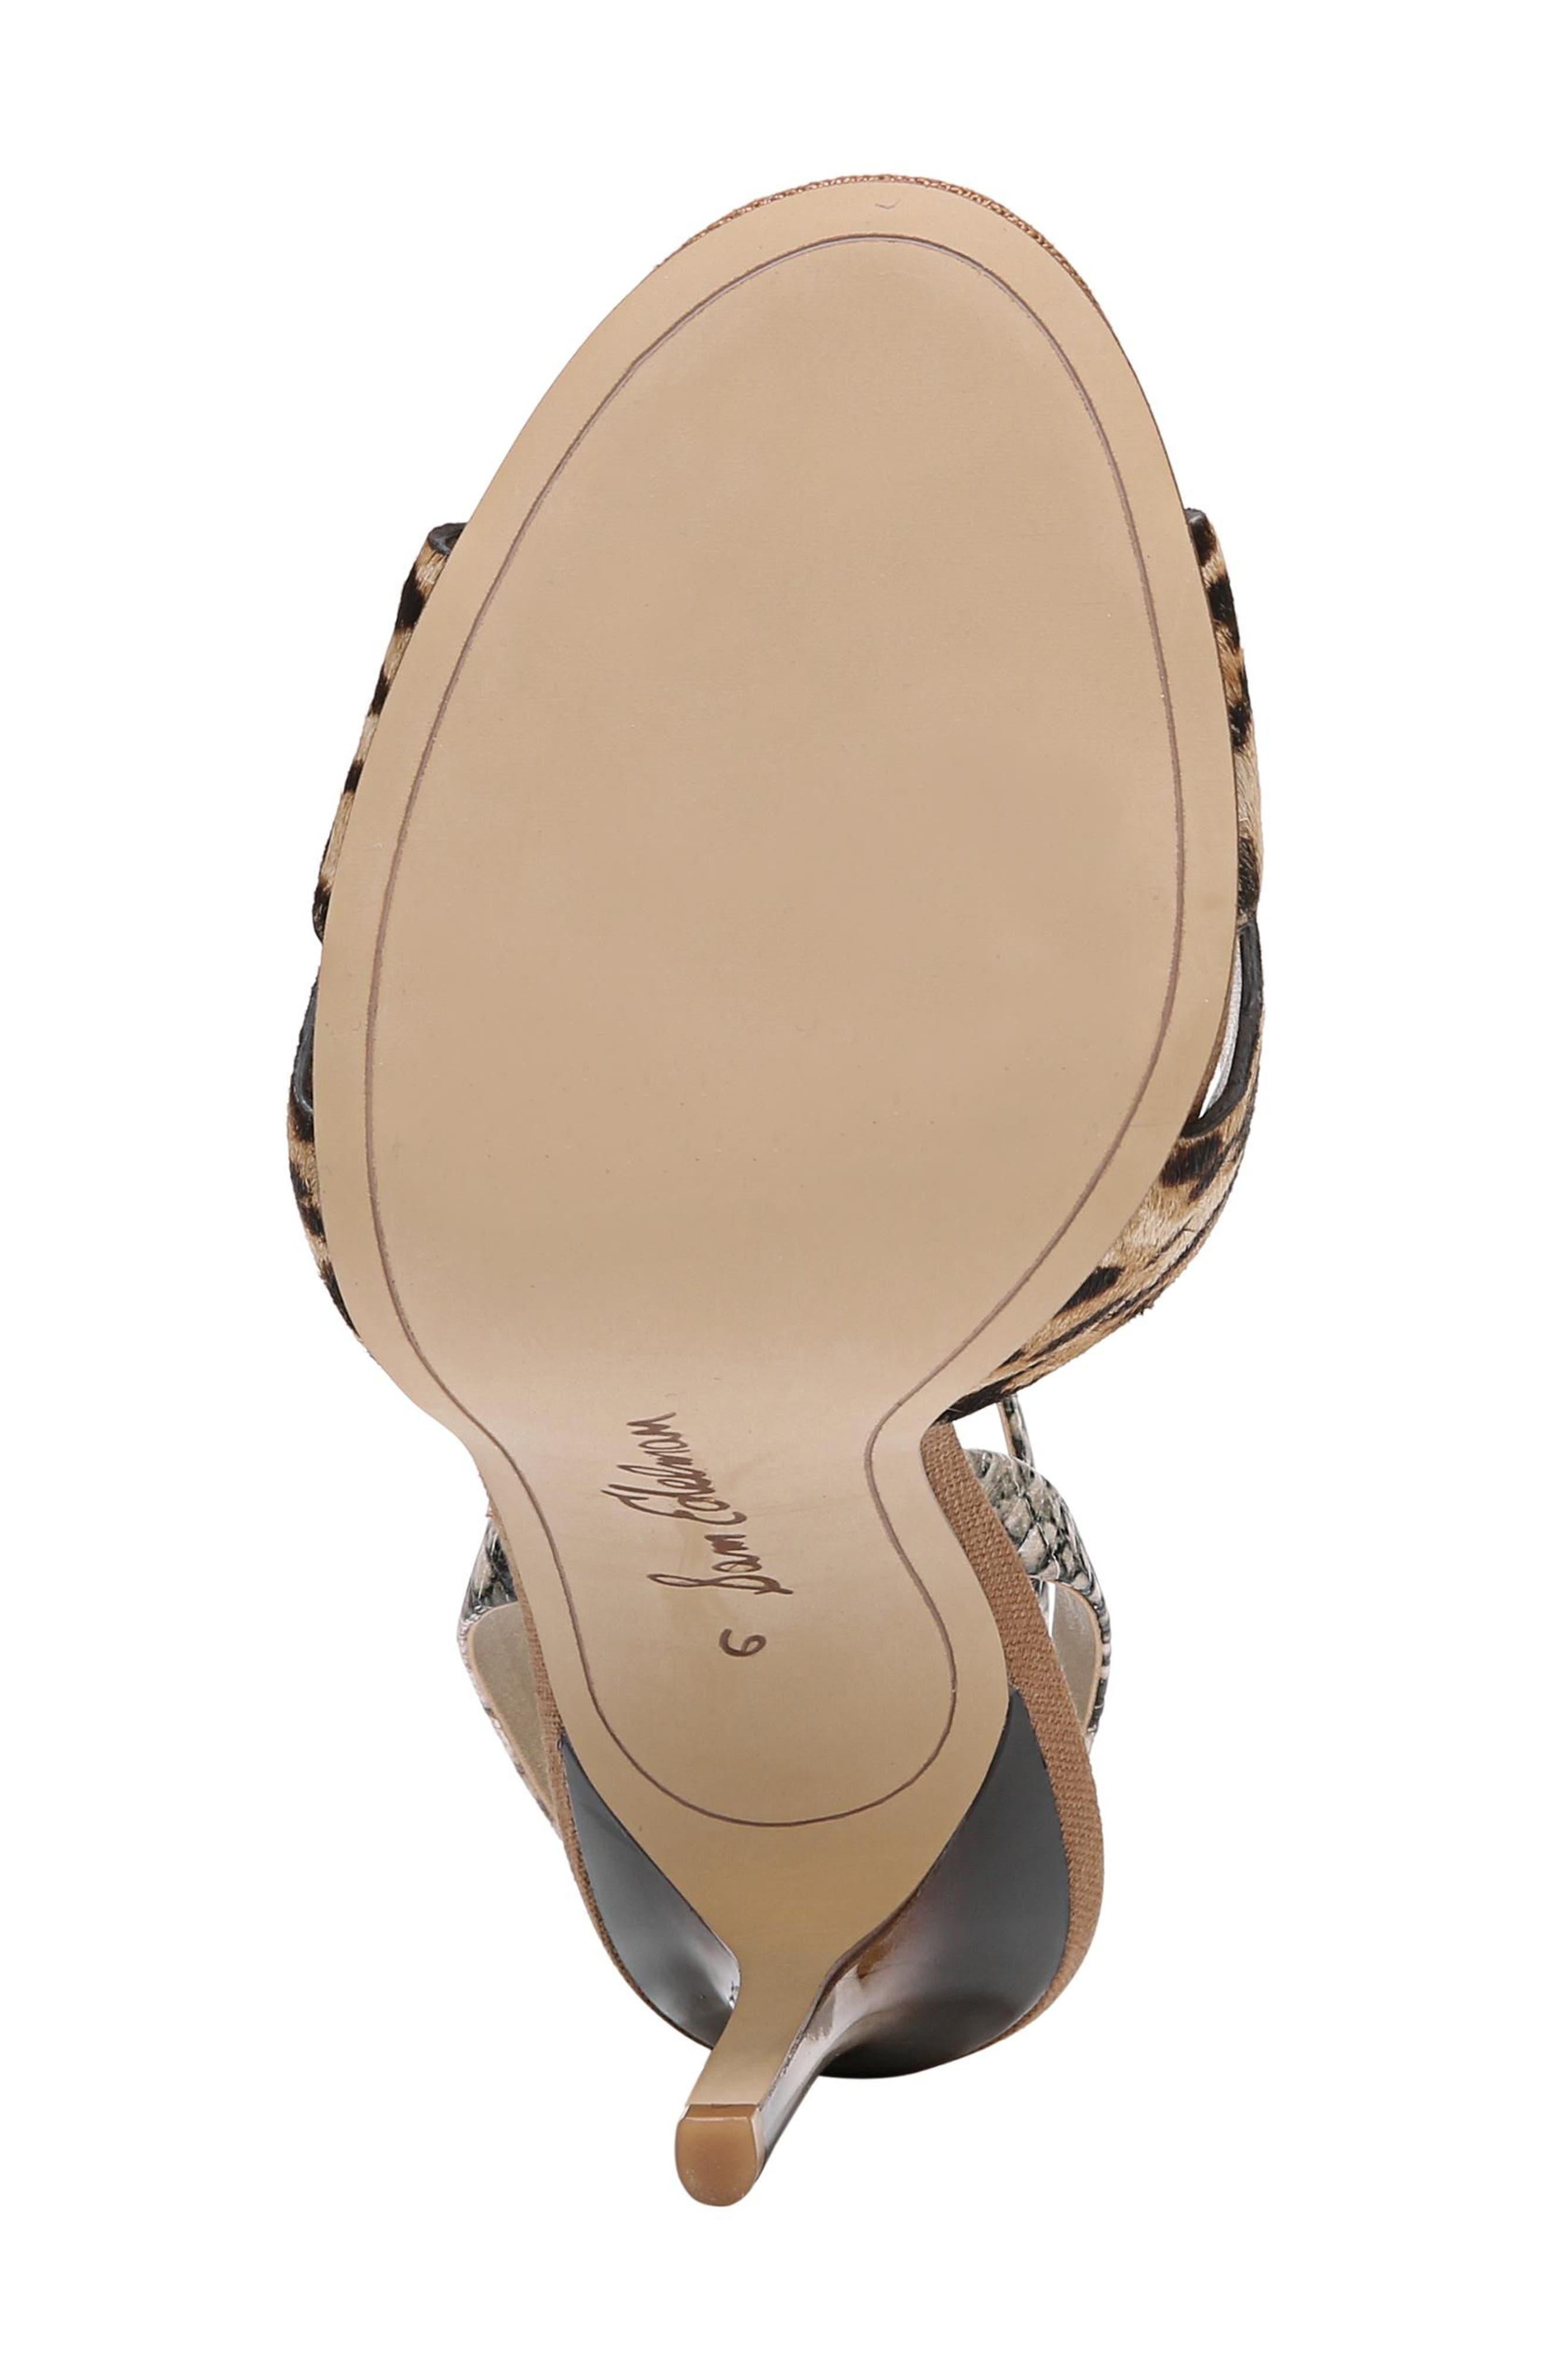 Aly Ankle Strap Sandal,                             Alternate thumbnail 6, color,                             Leopard Print Calf Hair